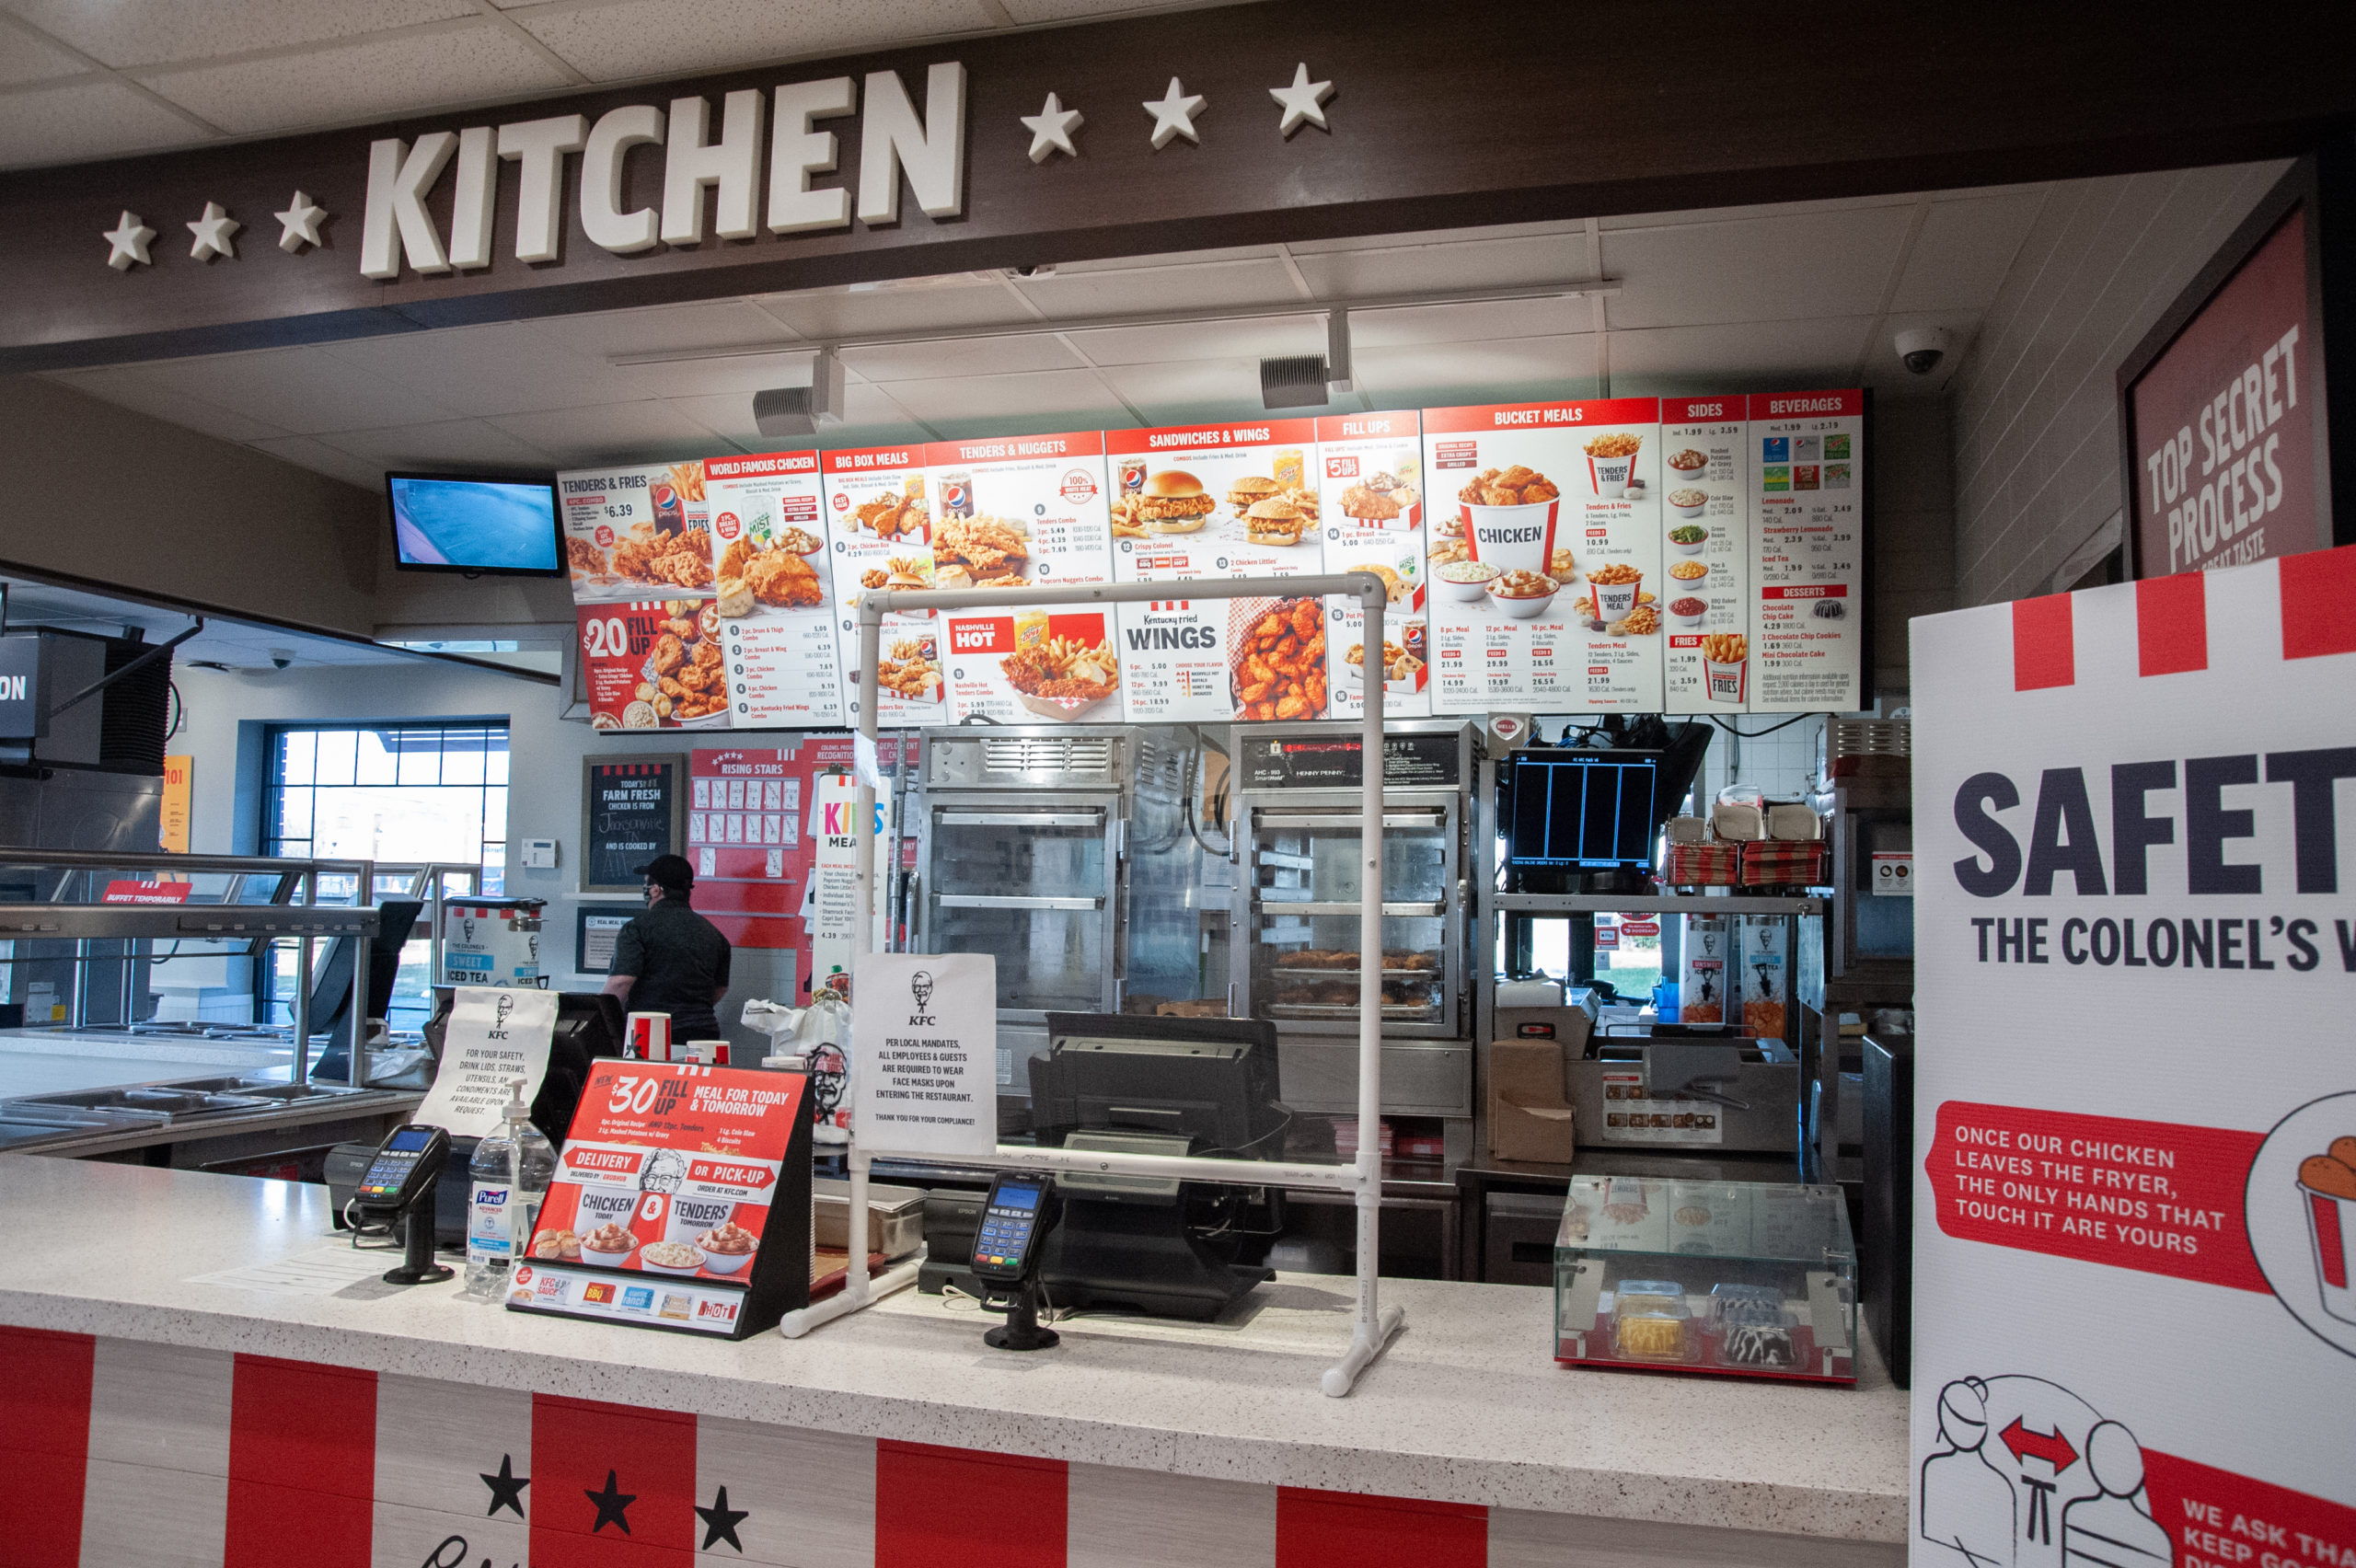 KFC ordering counter